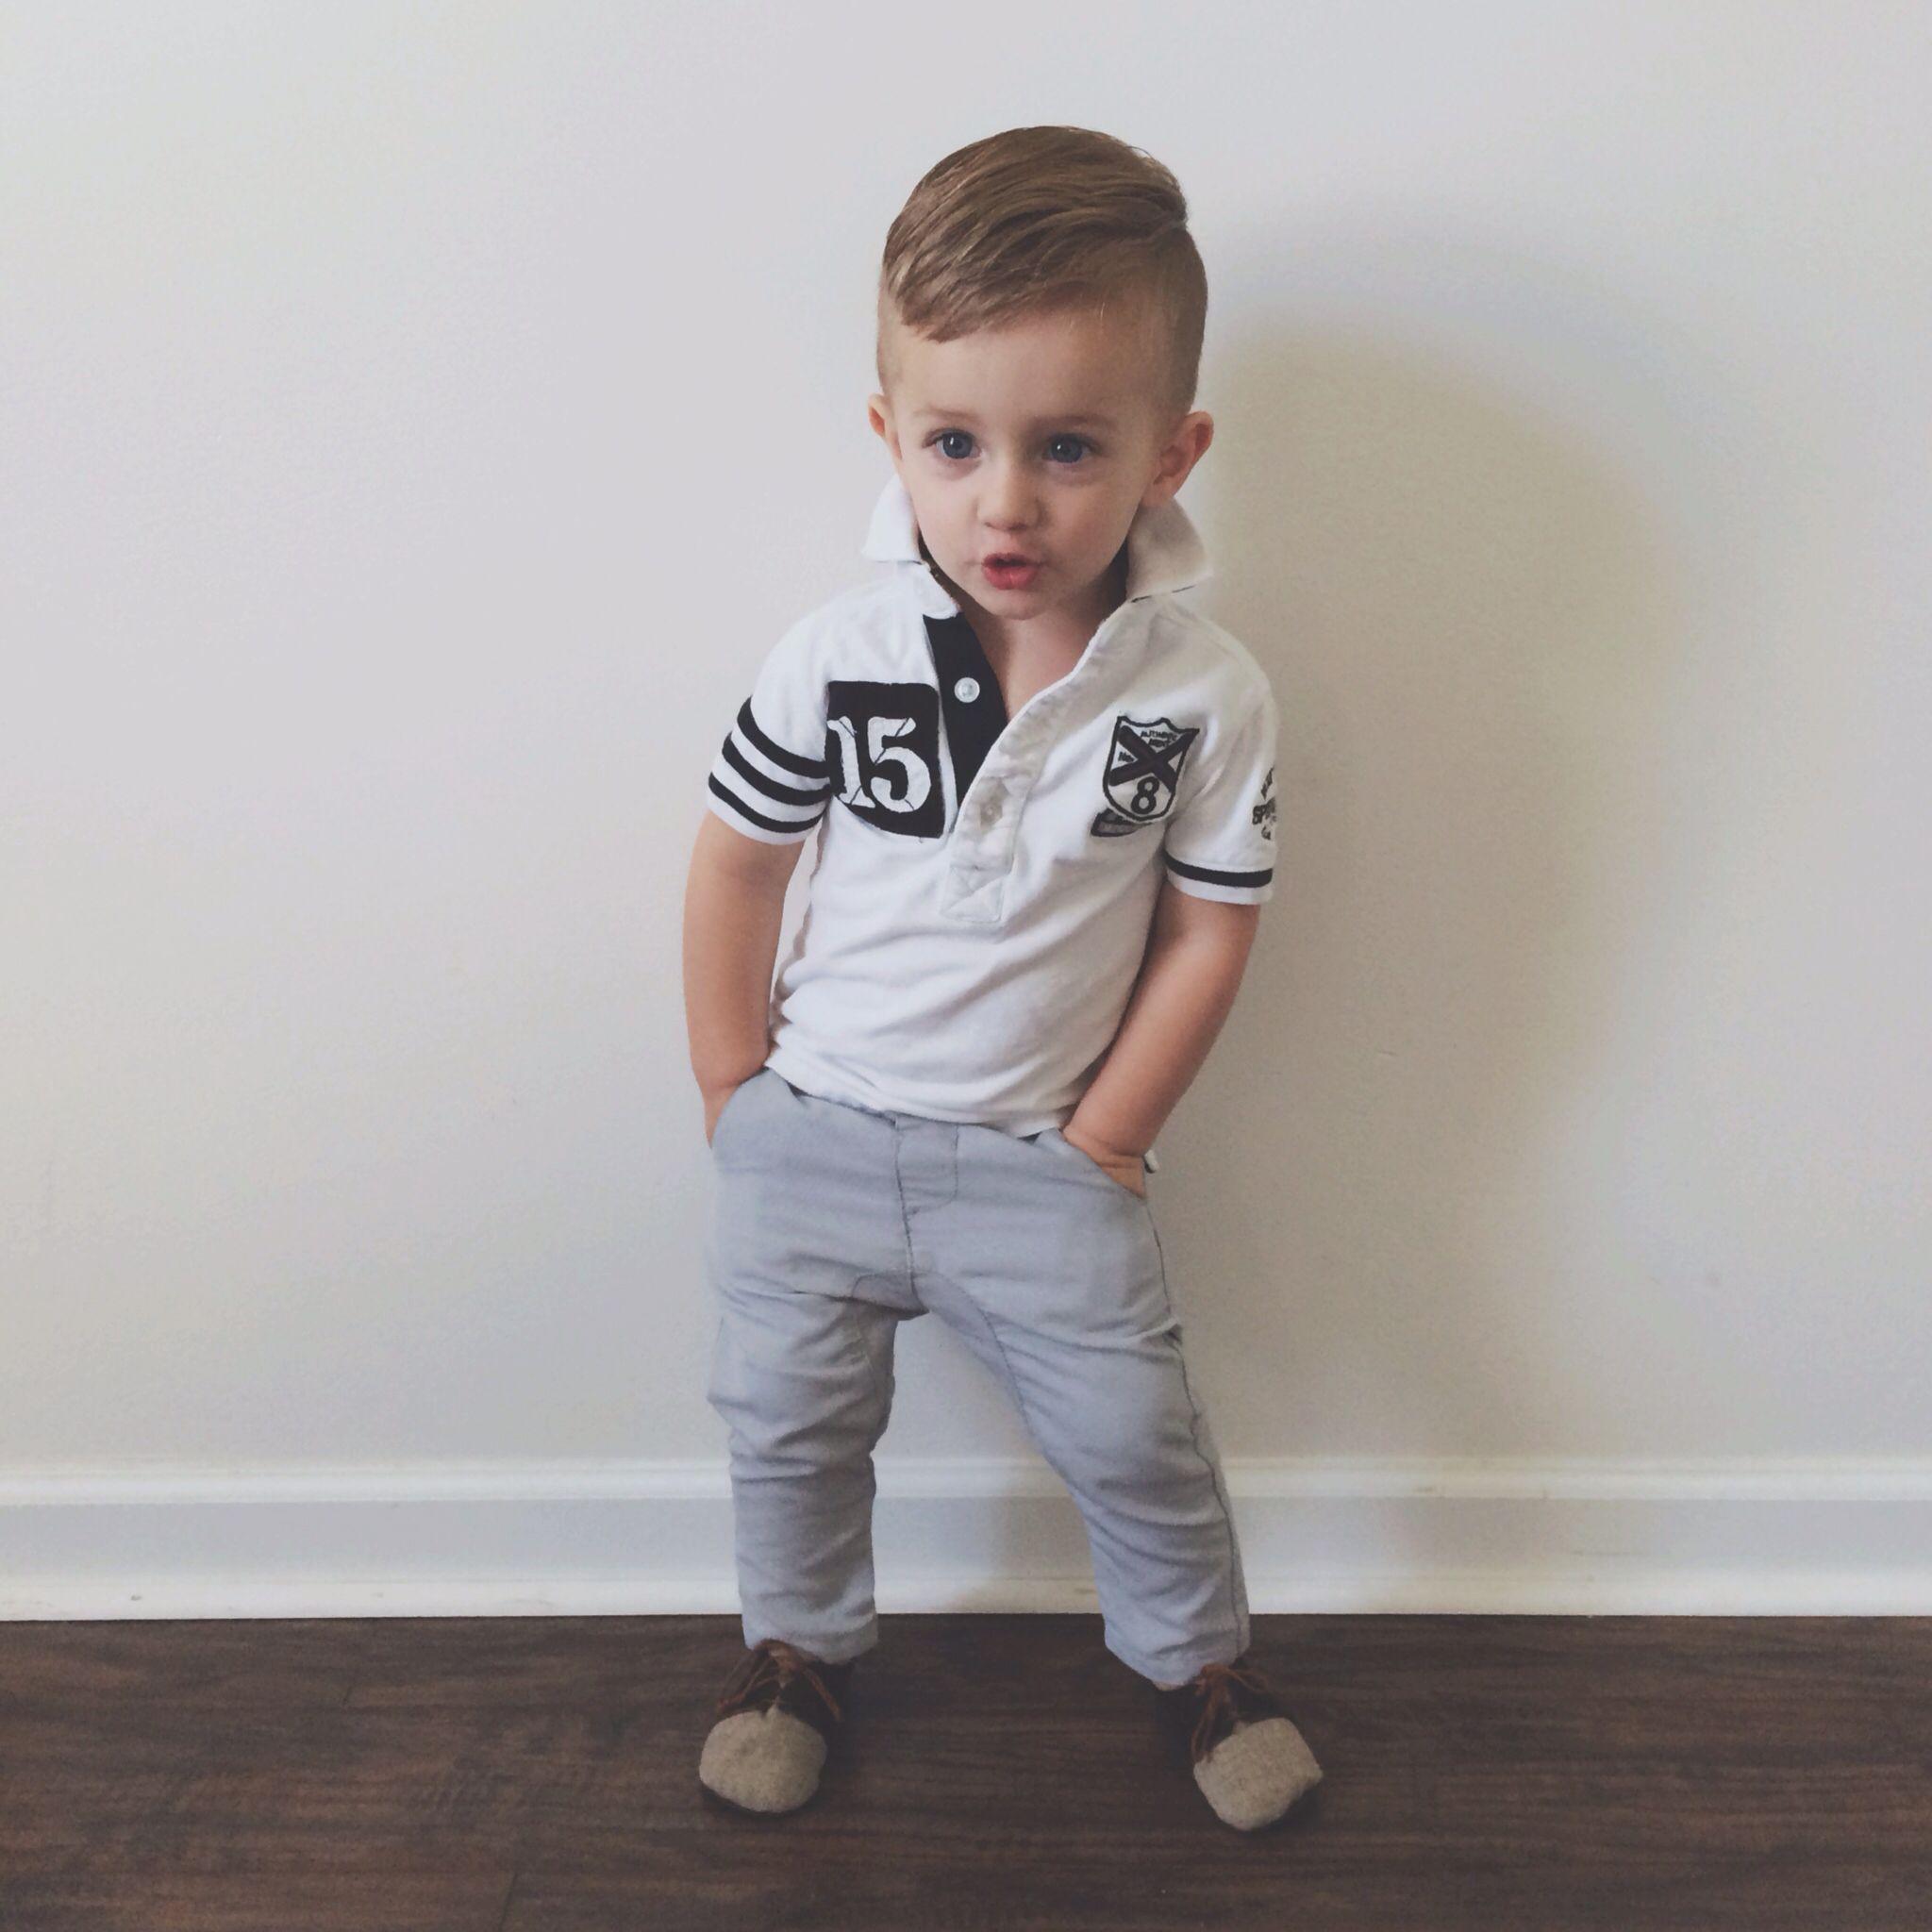 Baby boy fashion via sarahknuth on Instagram. What Rome